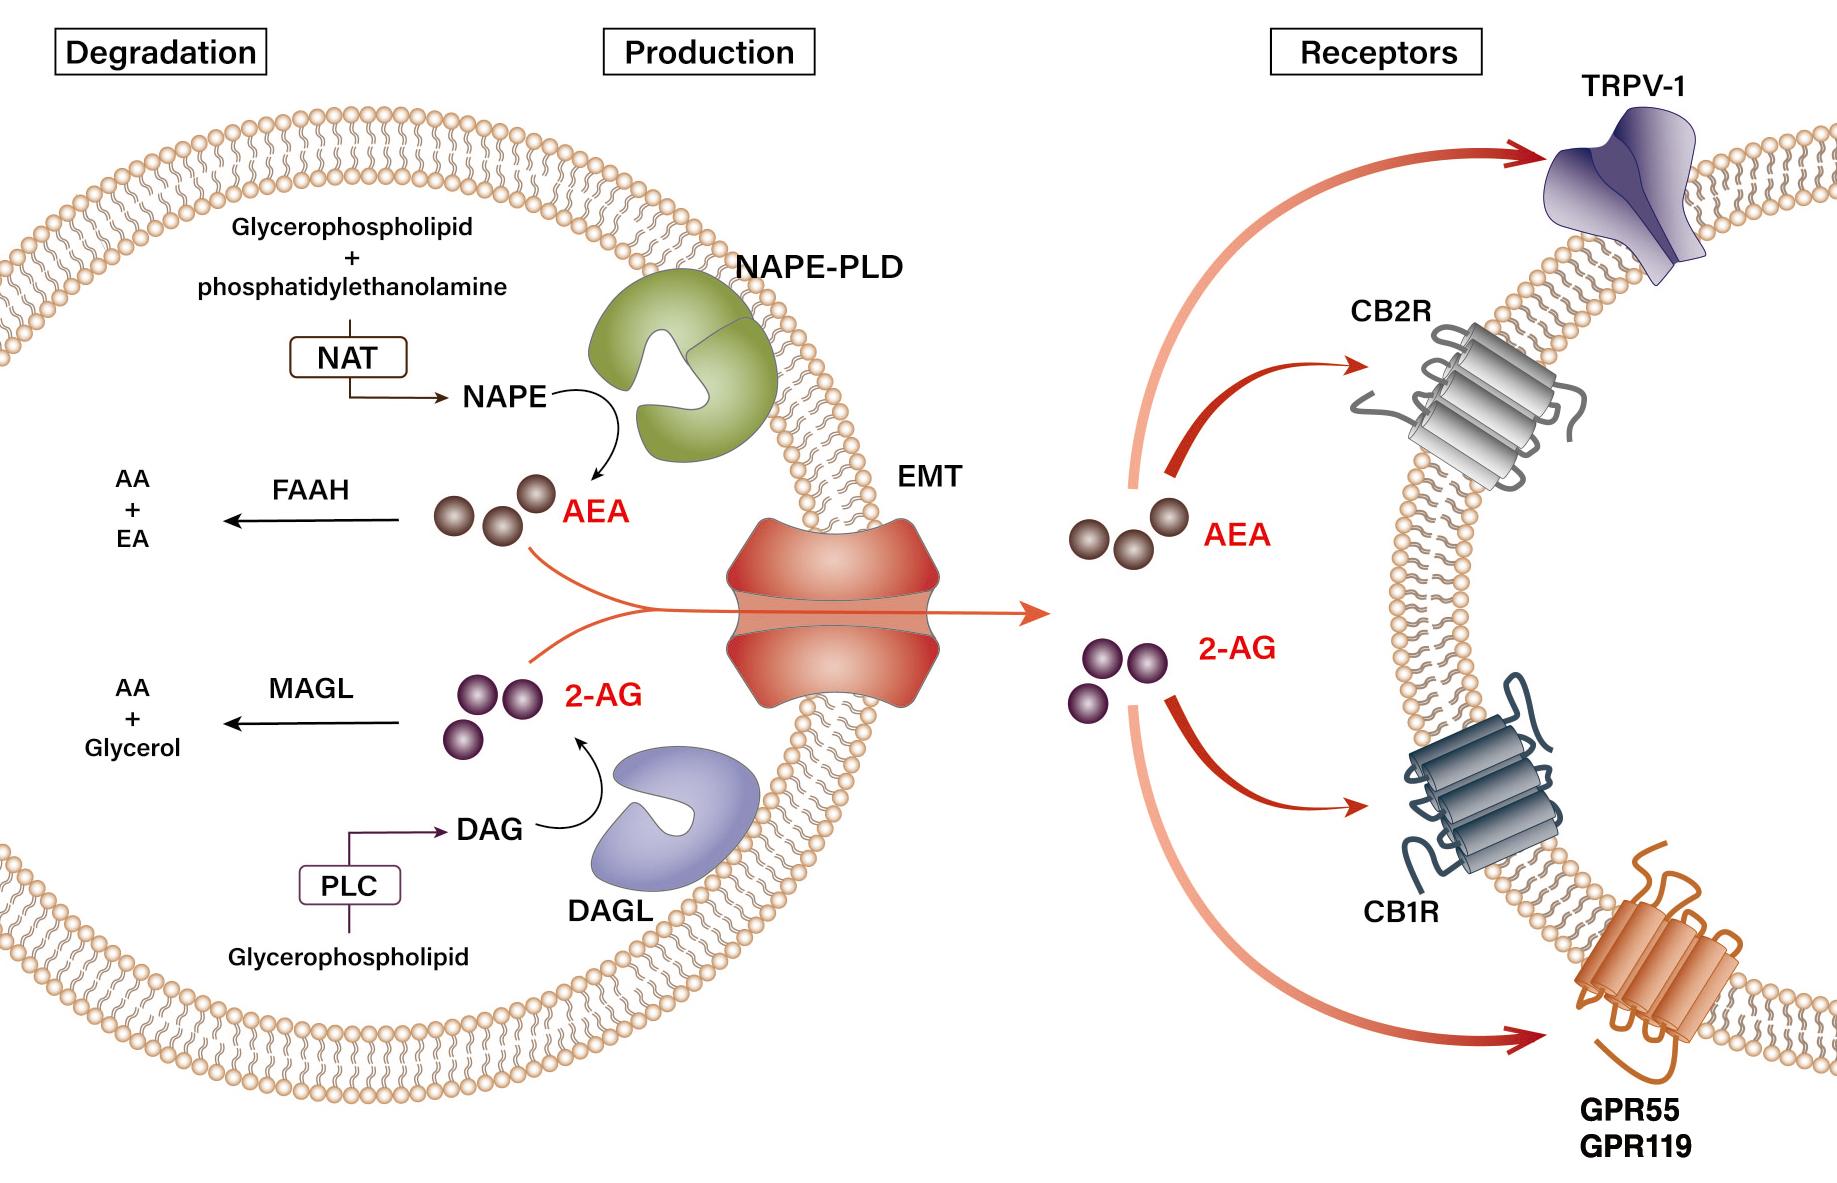 Biosynthesis and degradation pathways of endocannabinoids.